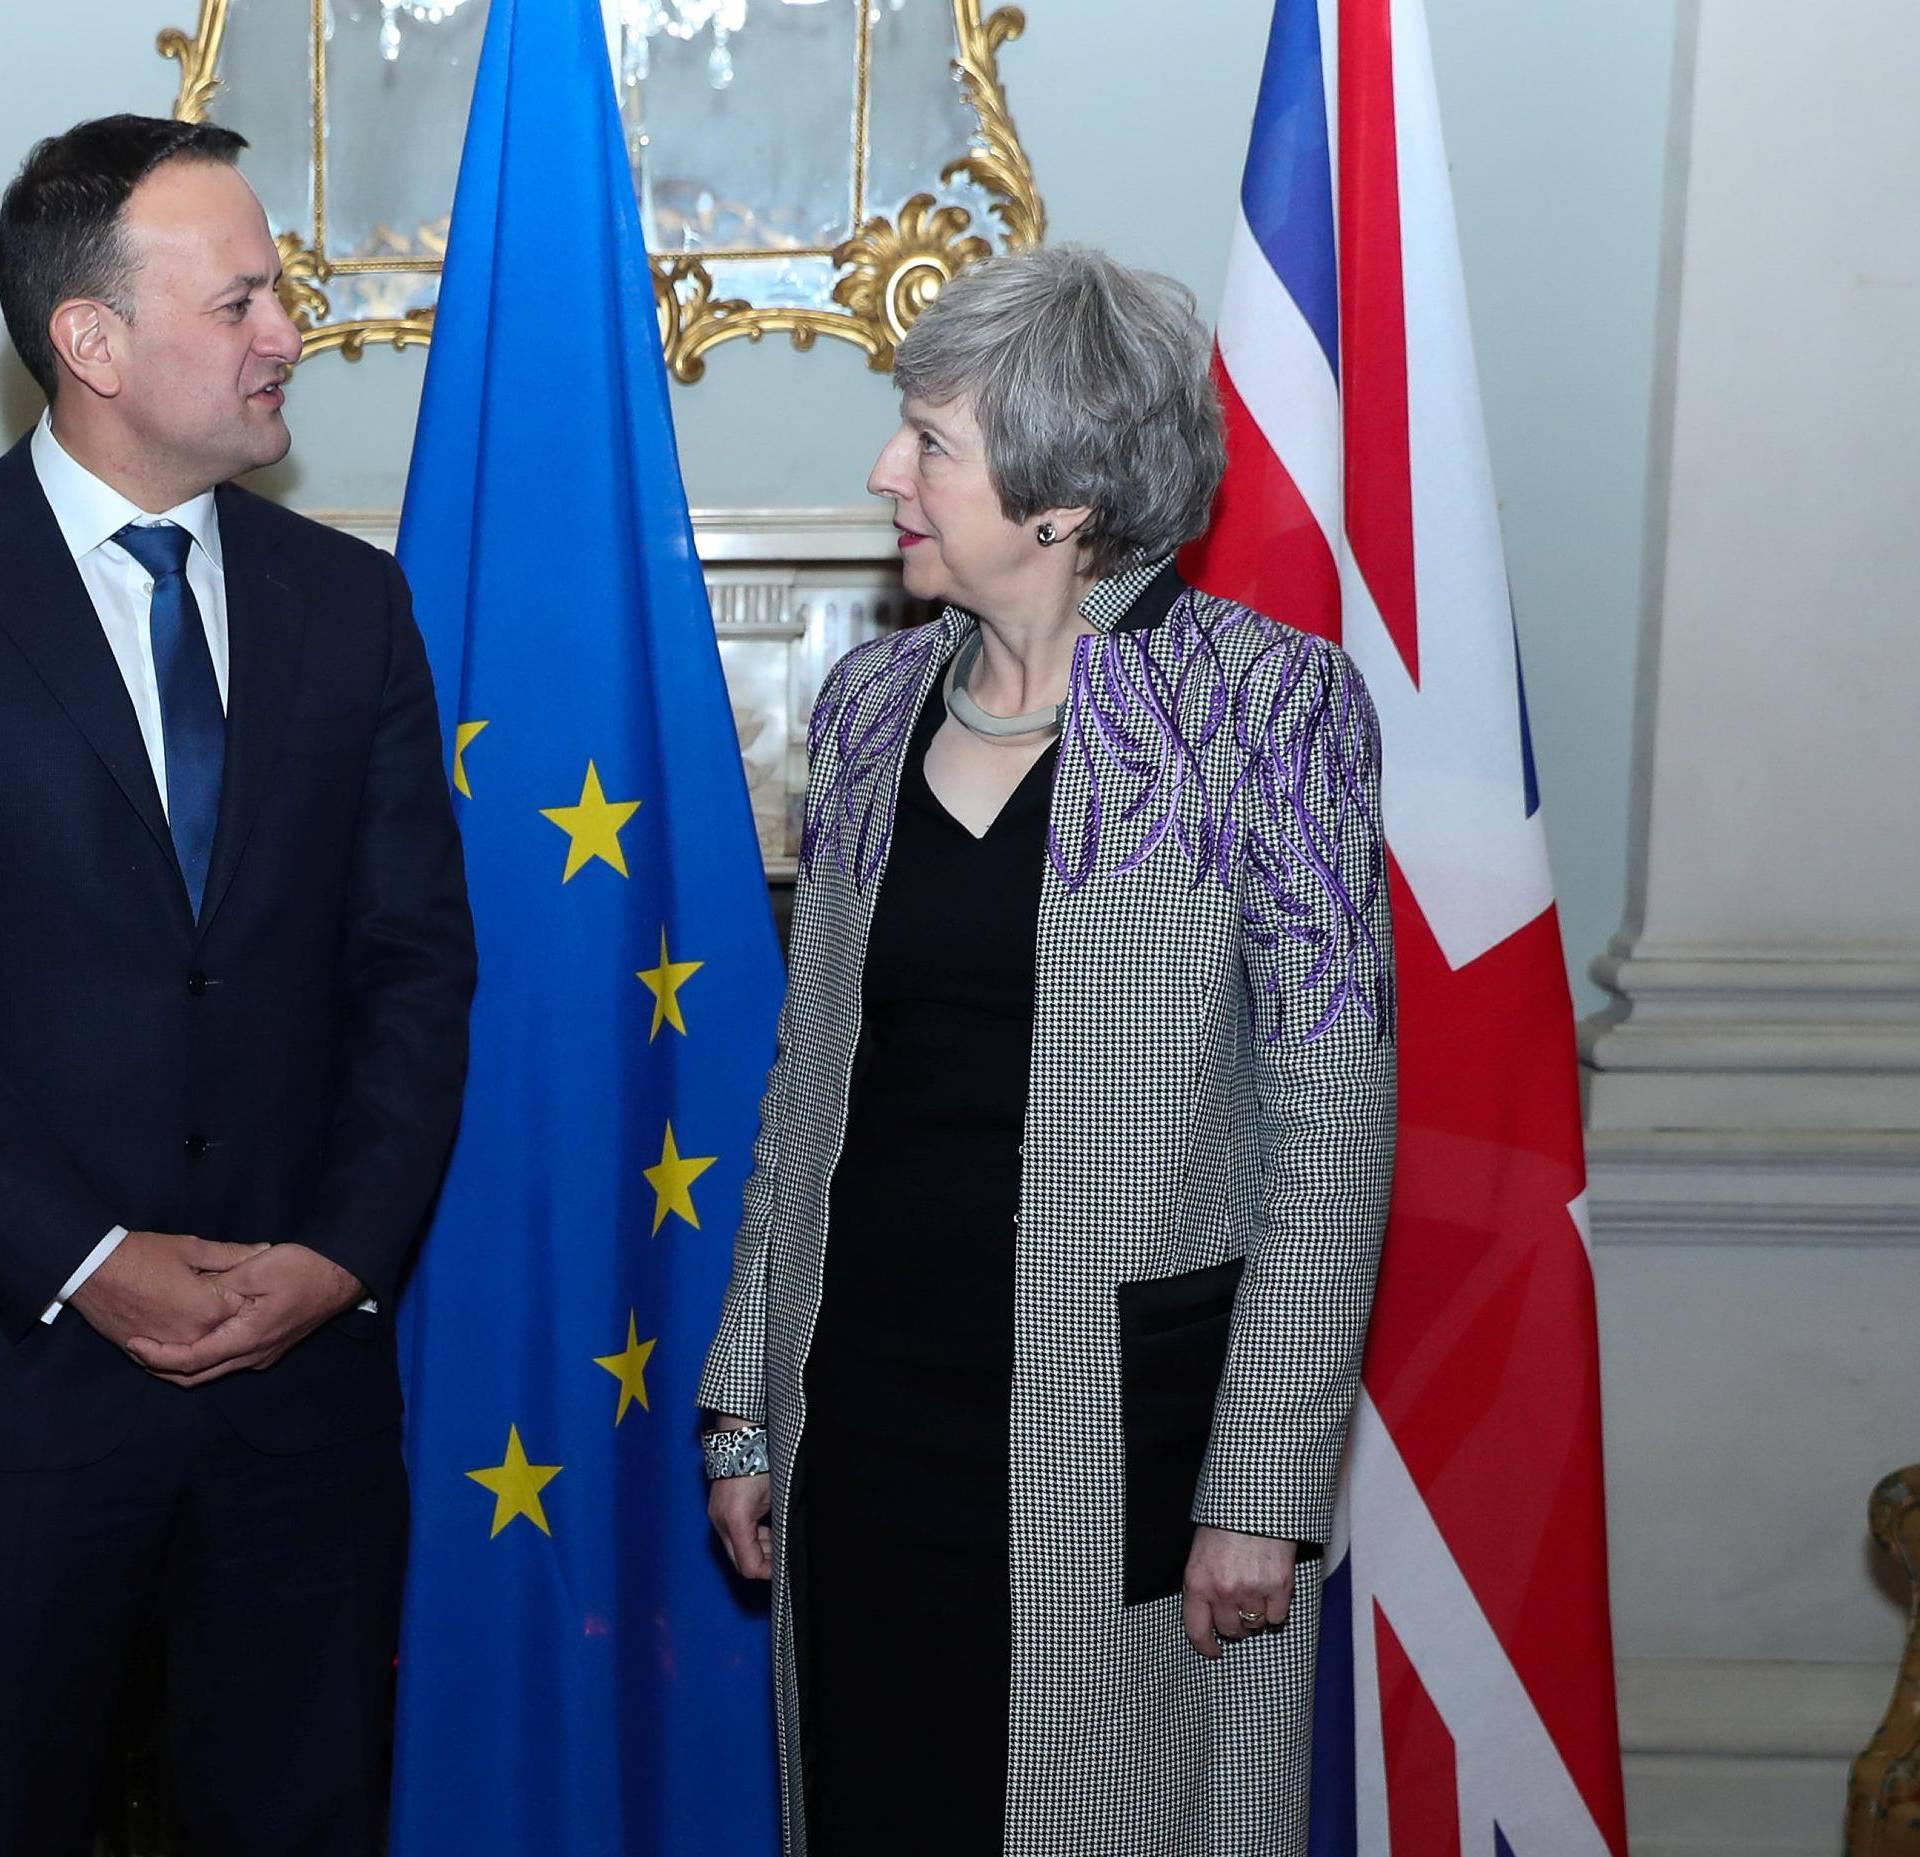 Britain's Prime Minister Theresa May meets Taoiseach Leo Varadkar in Dublin